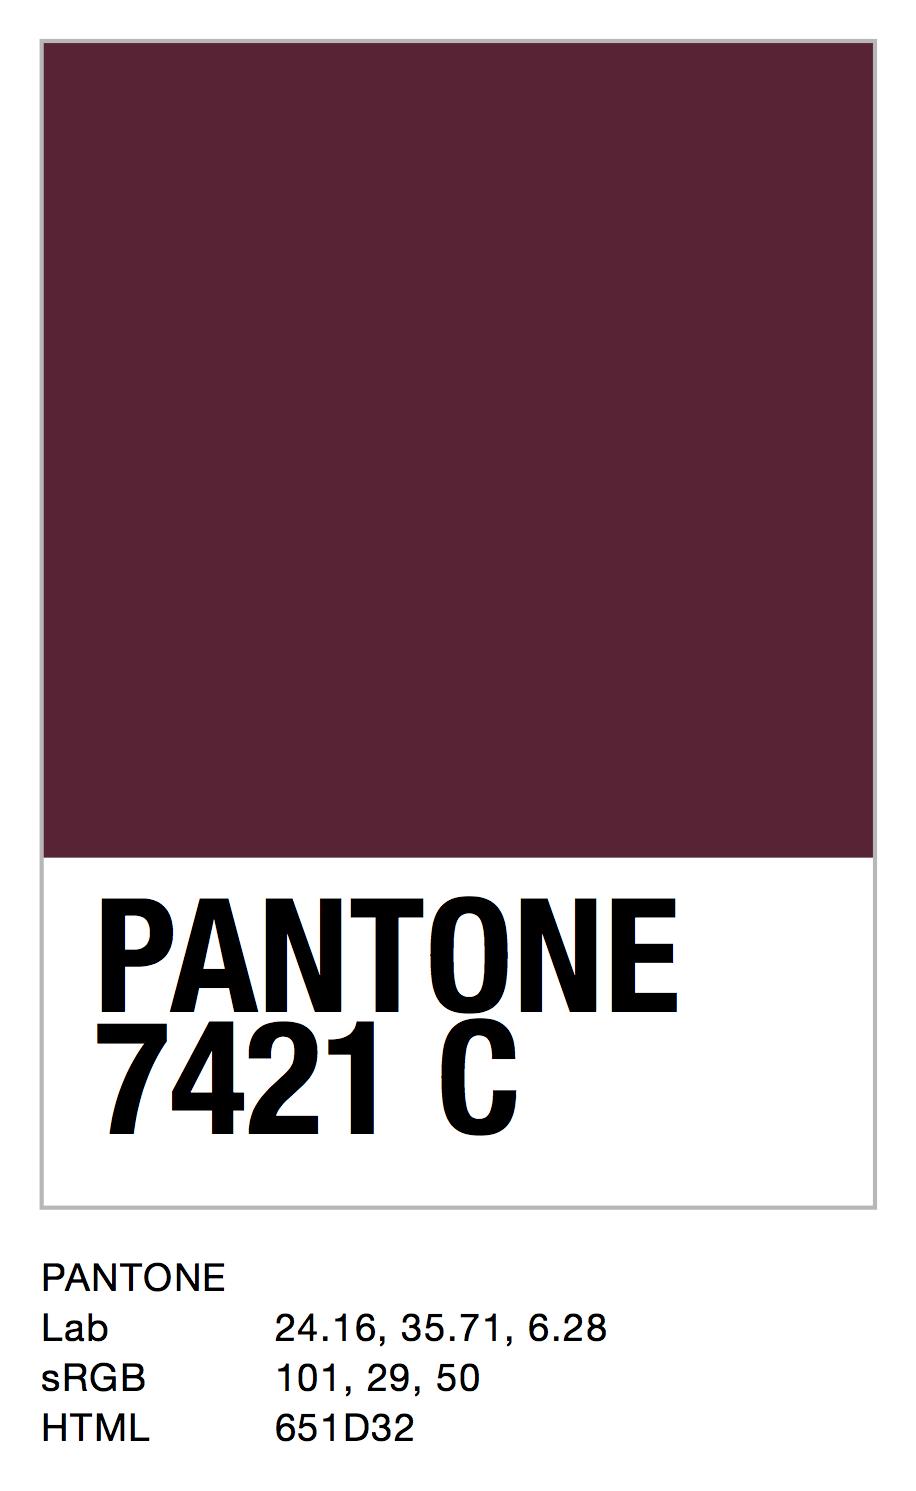 PANTONE 7421 C.jpg